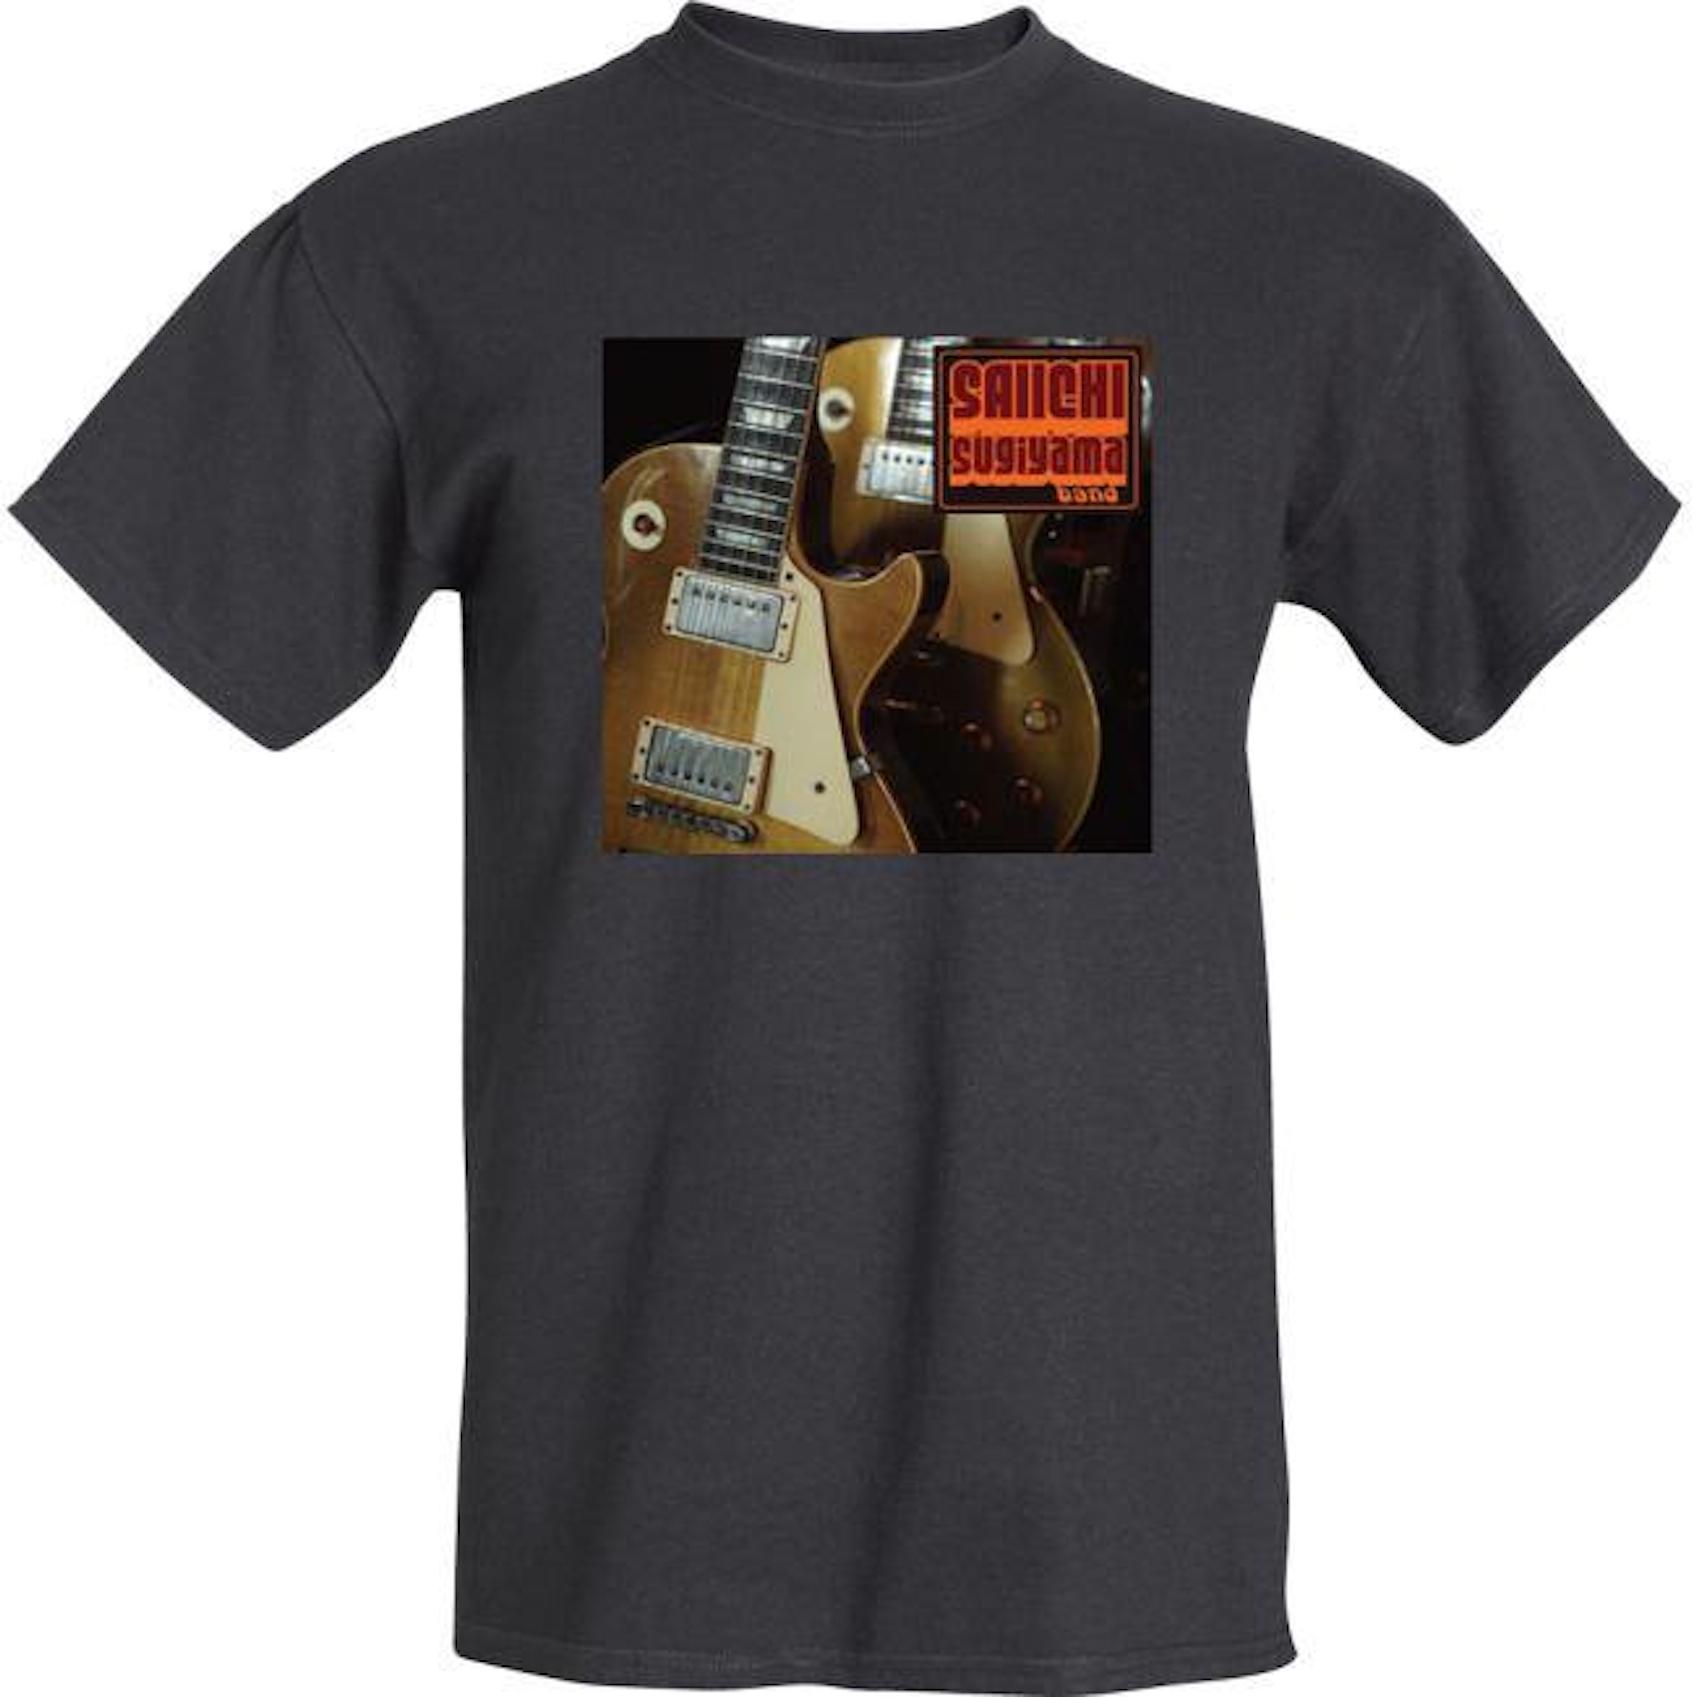 Band shirt saiichi sugiyama band for Making band t shirts